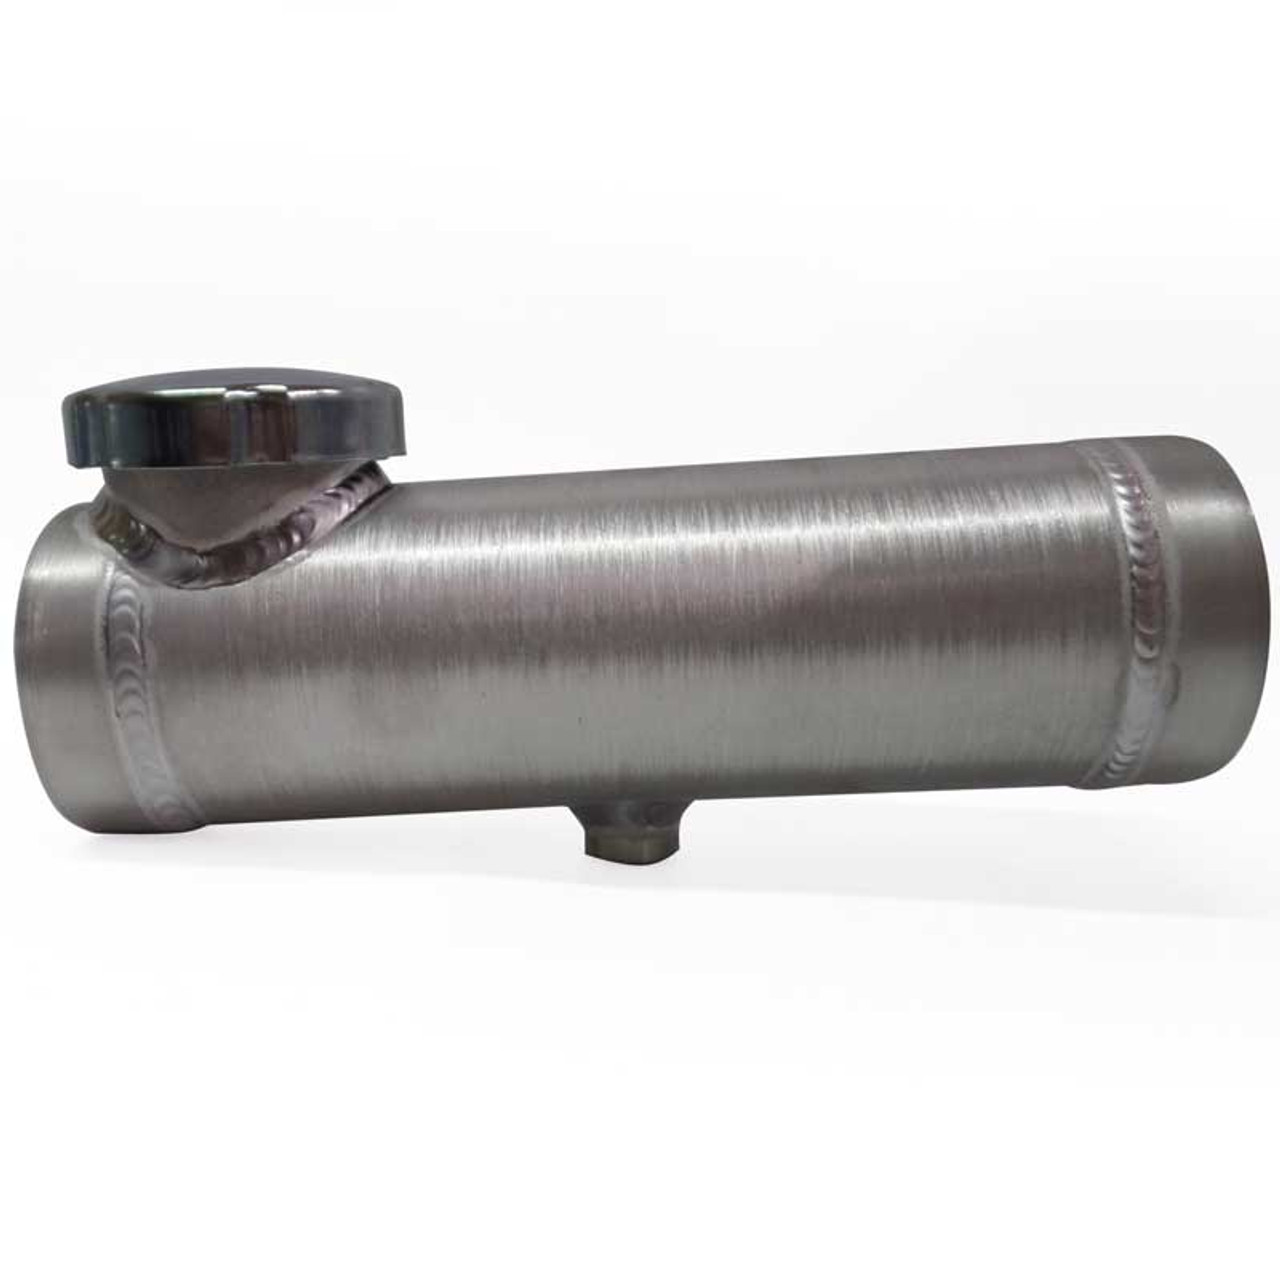 Spun Aluminum Round 3x10 Fuel Tank with (2) Brackets